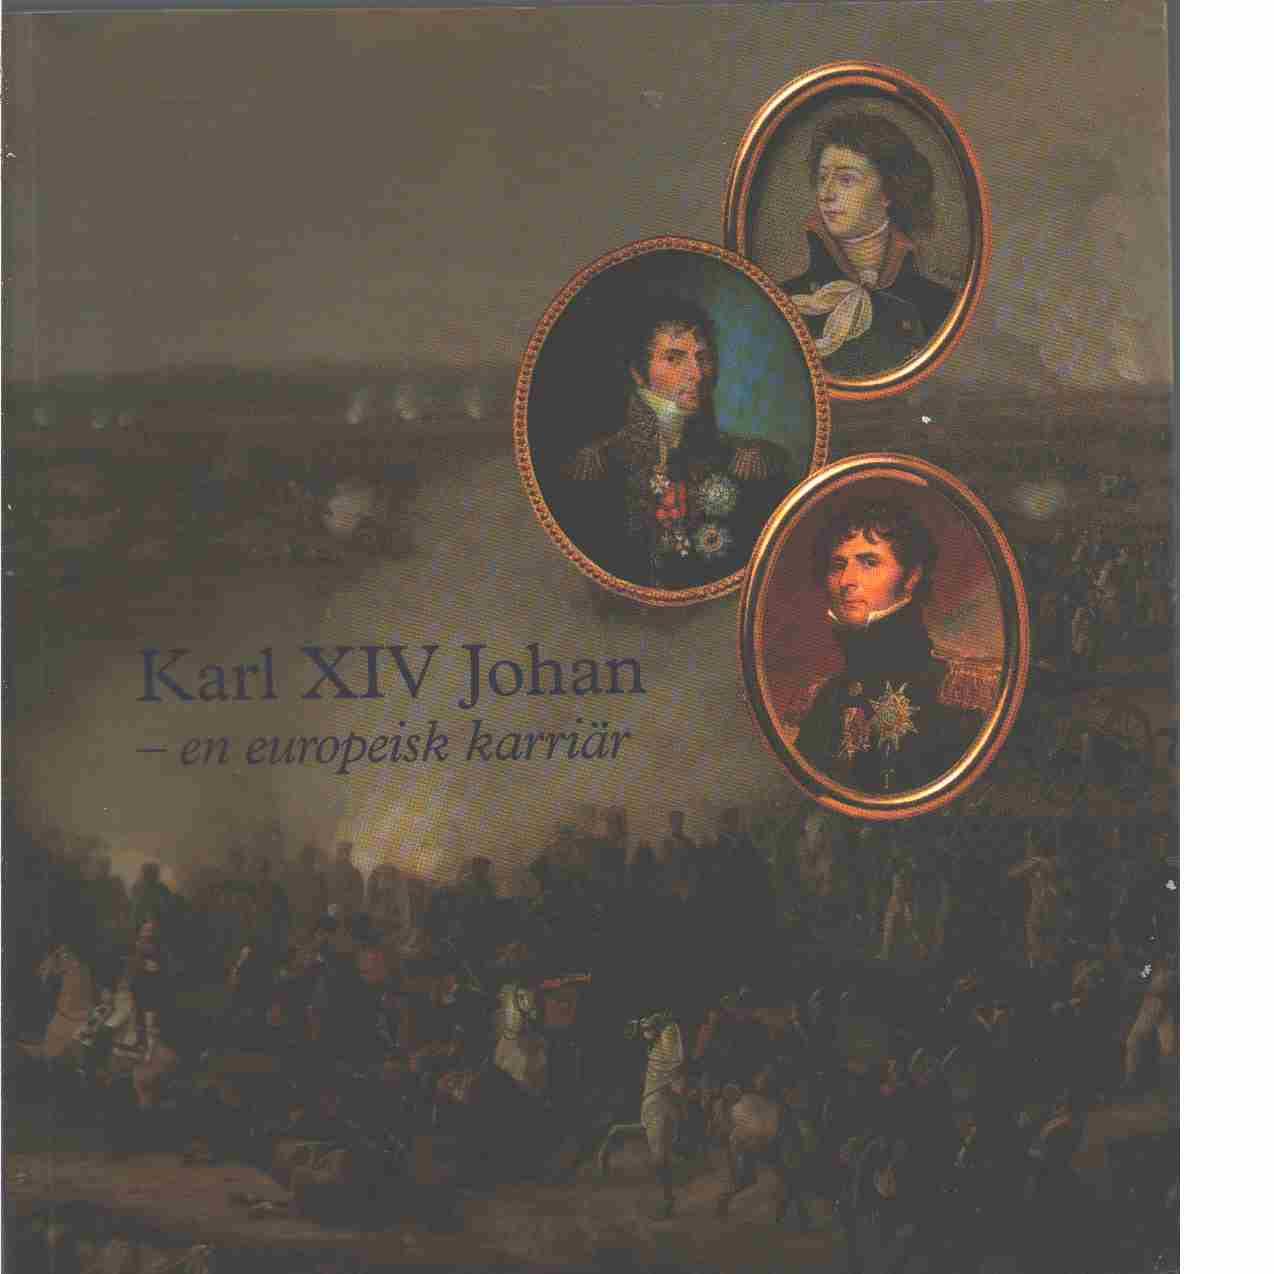 Karl XIV Johan : en europeisk karriär - Red. Ramsay Herthelius, Antoinette